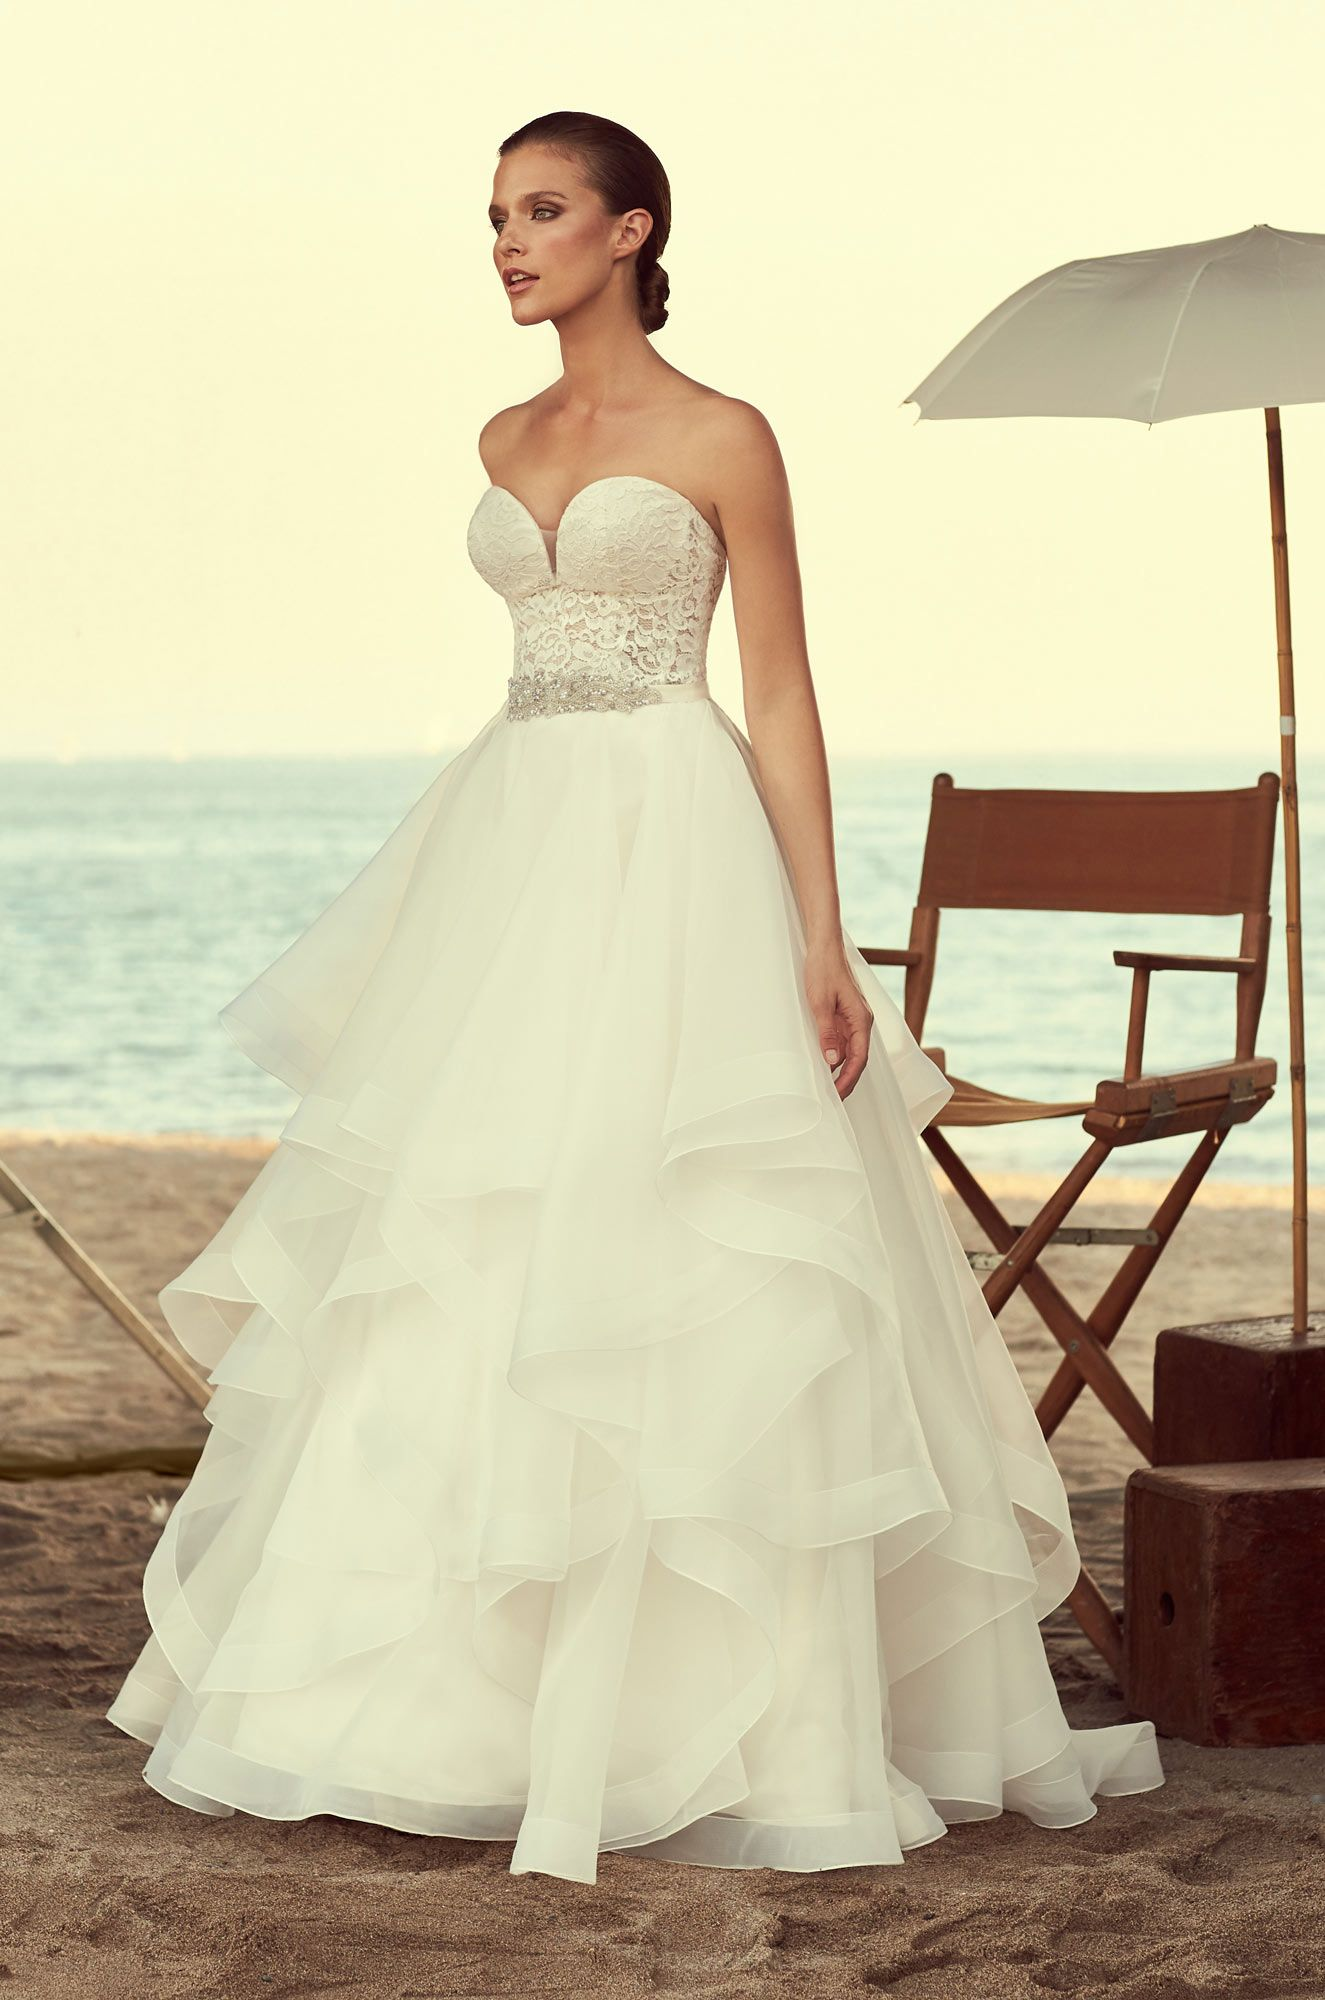 Strapless Corset Wedding Dress Style 2192 Mikaella Bridal Bridal Ball Gown Wedding Dress Organza Wedding Dresses Strapless